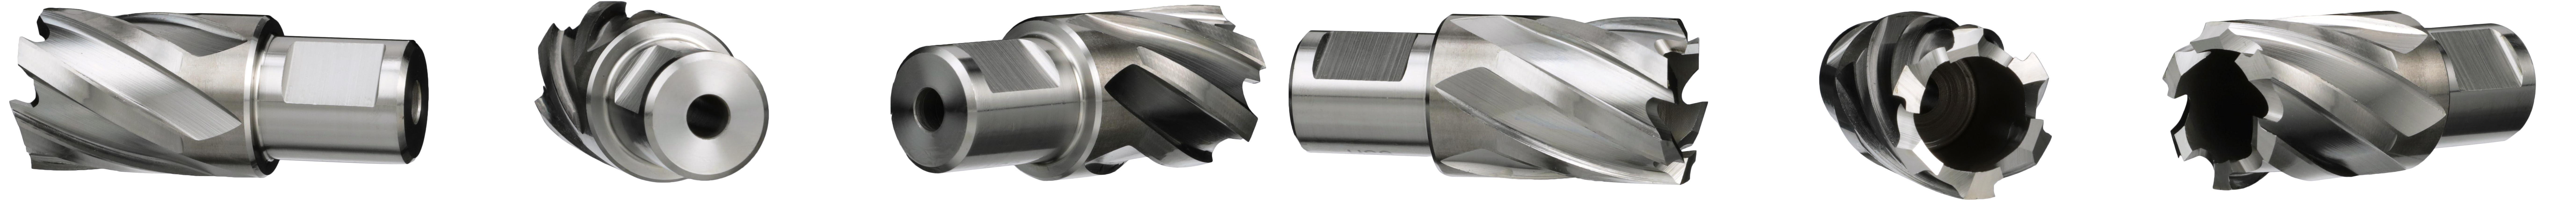 3 Cutting Depth High-Speed Steel Drill America DWC Series Qualtech Pilot Annular Cutter Pack of 1